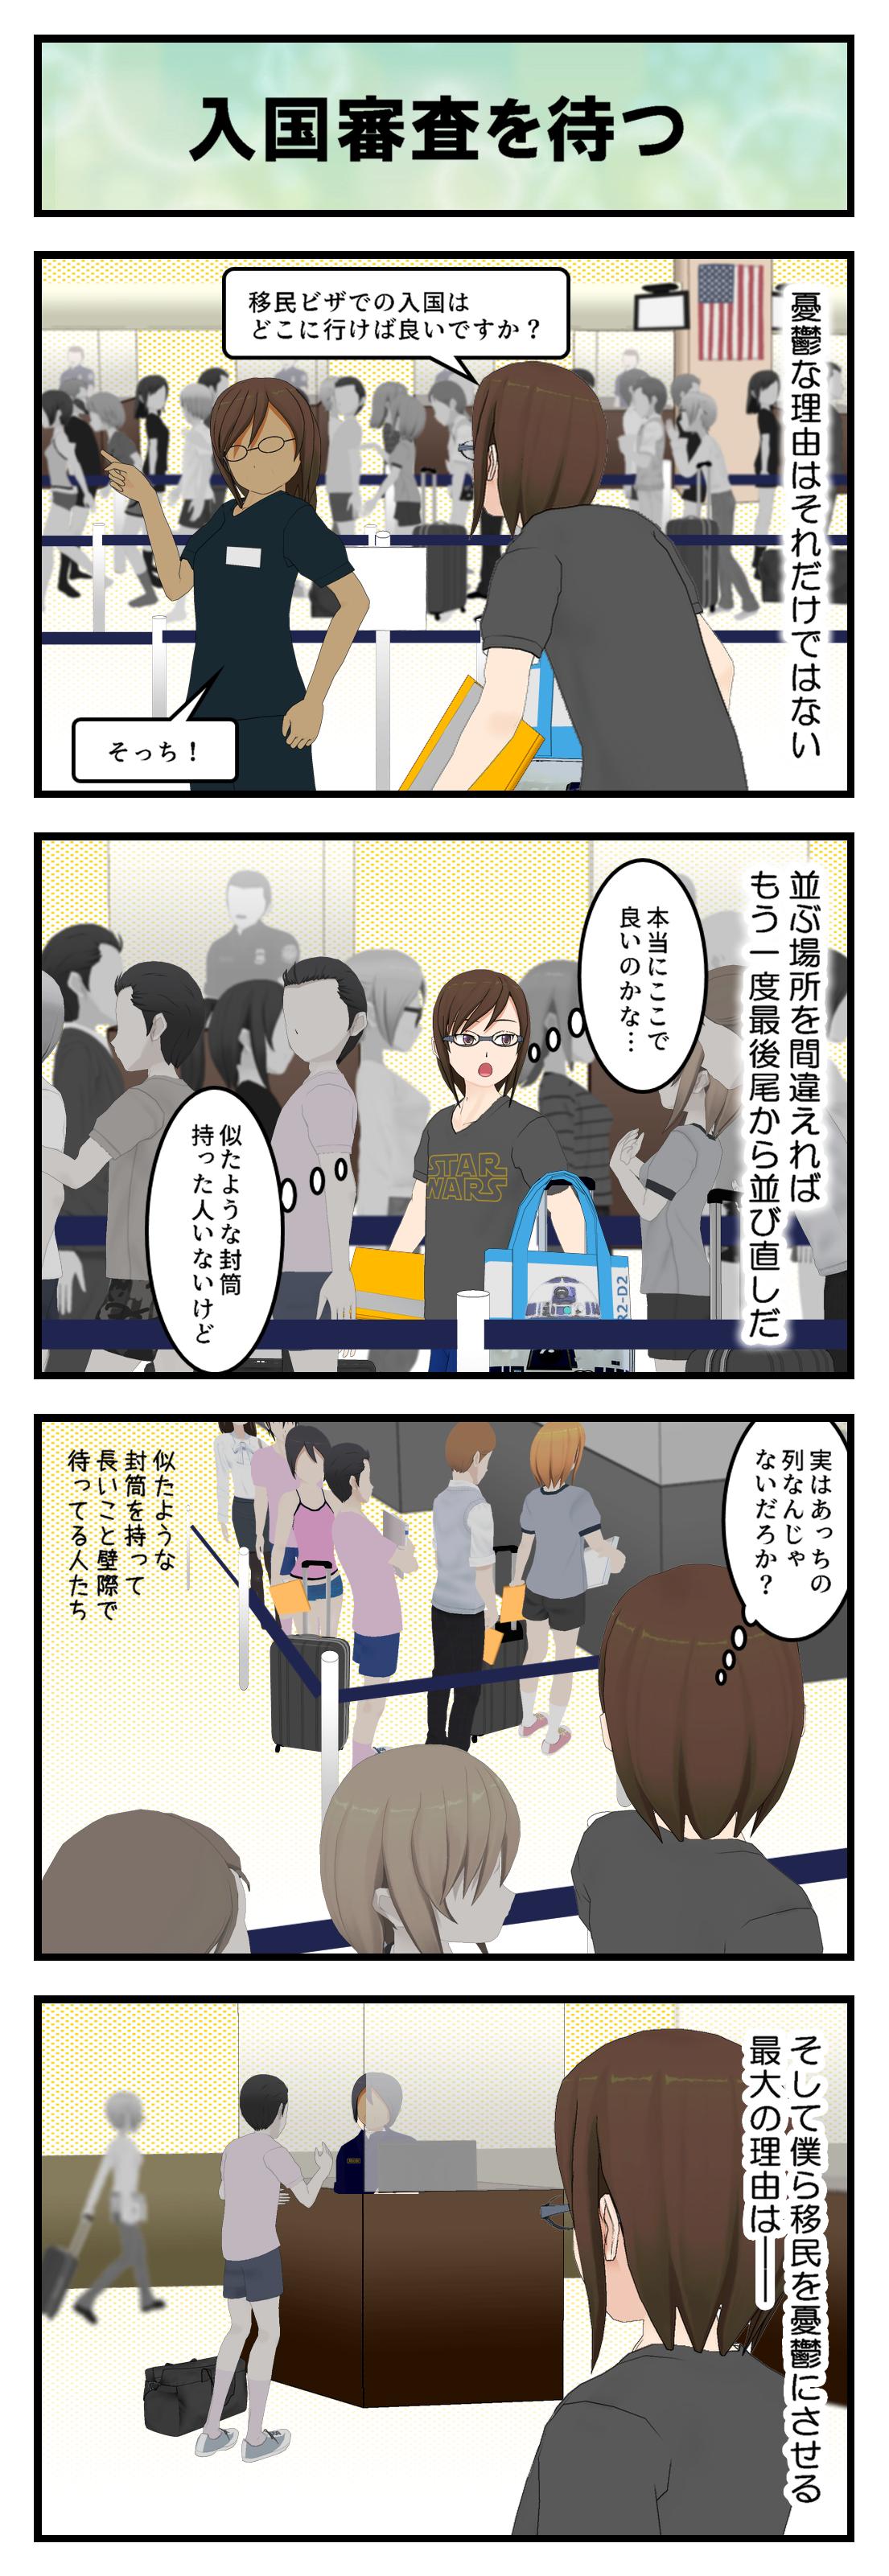 R002_入国審査を待つ_001